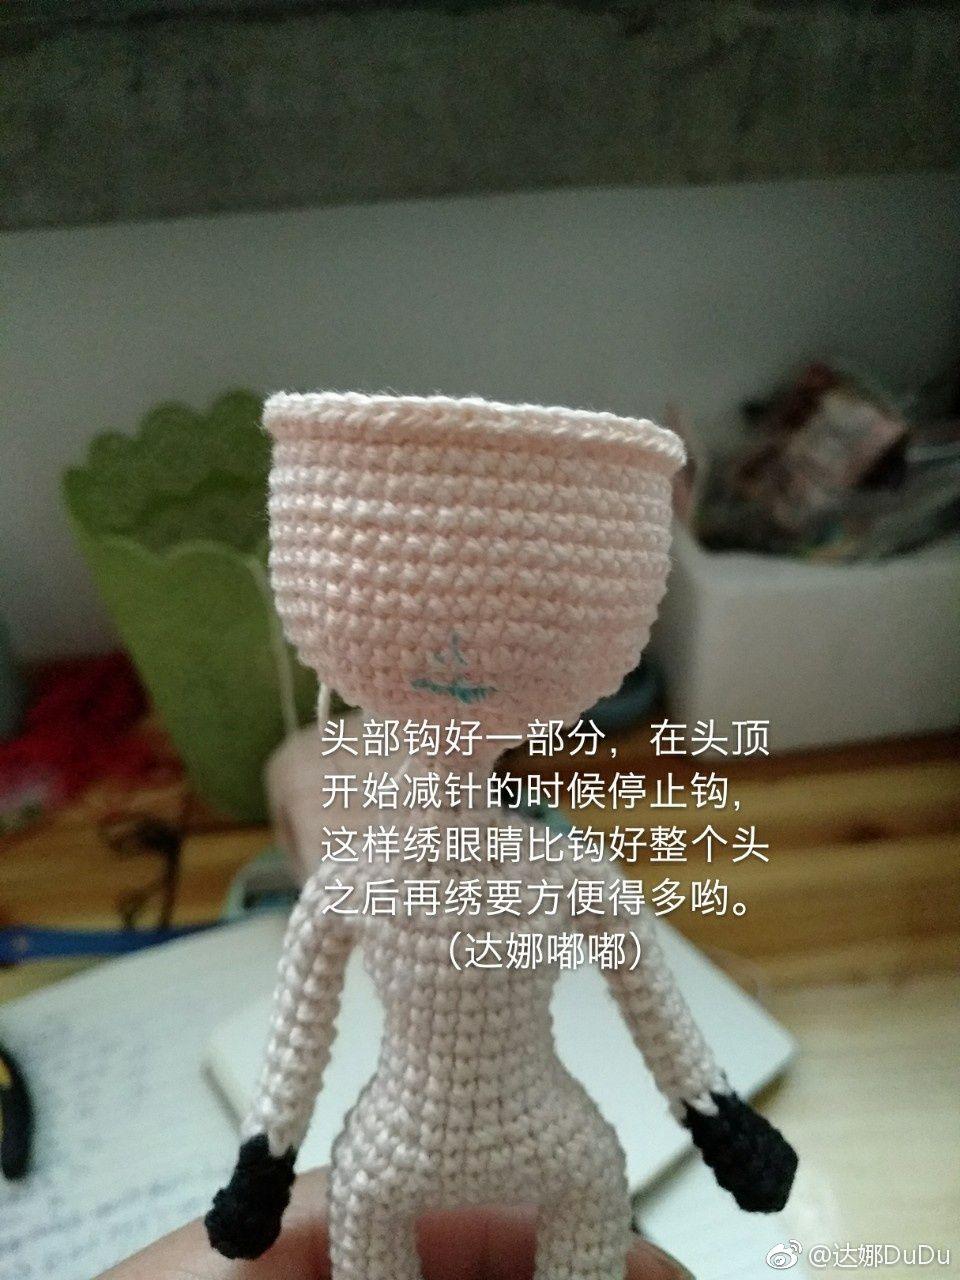 Pin de 🌹PatriciaZanoni🌹 en ~ Crochet doll WIP ~   Pinterest ...